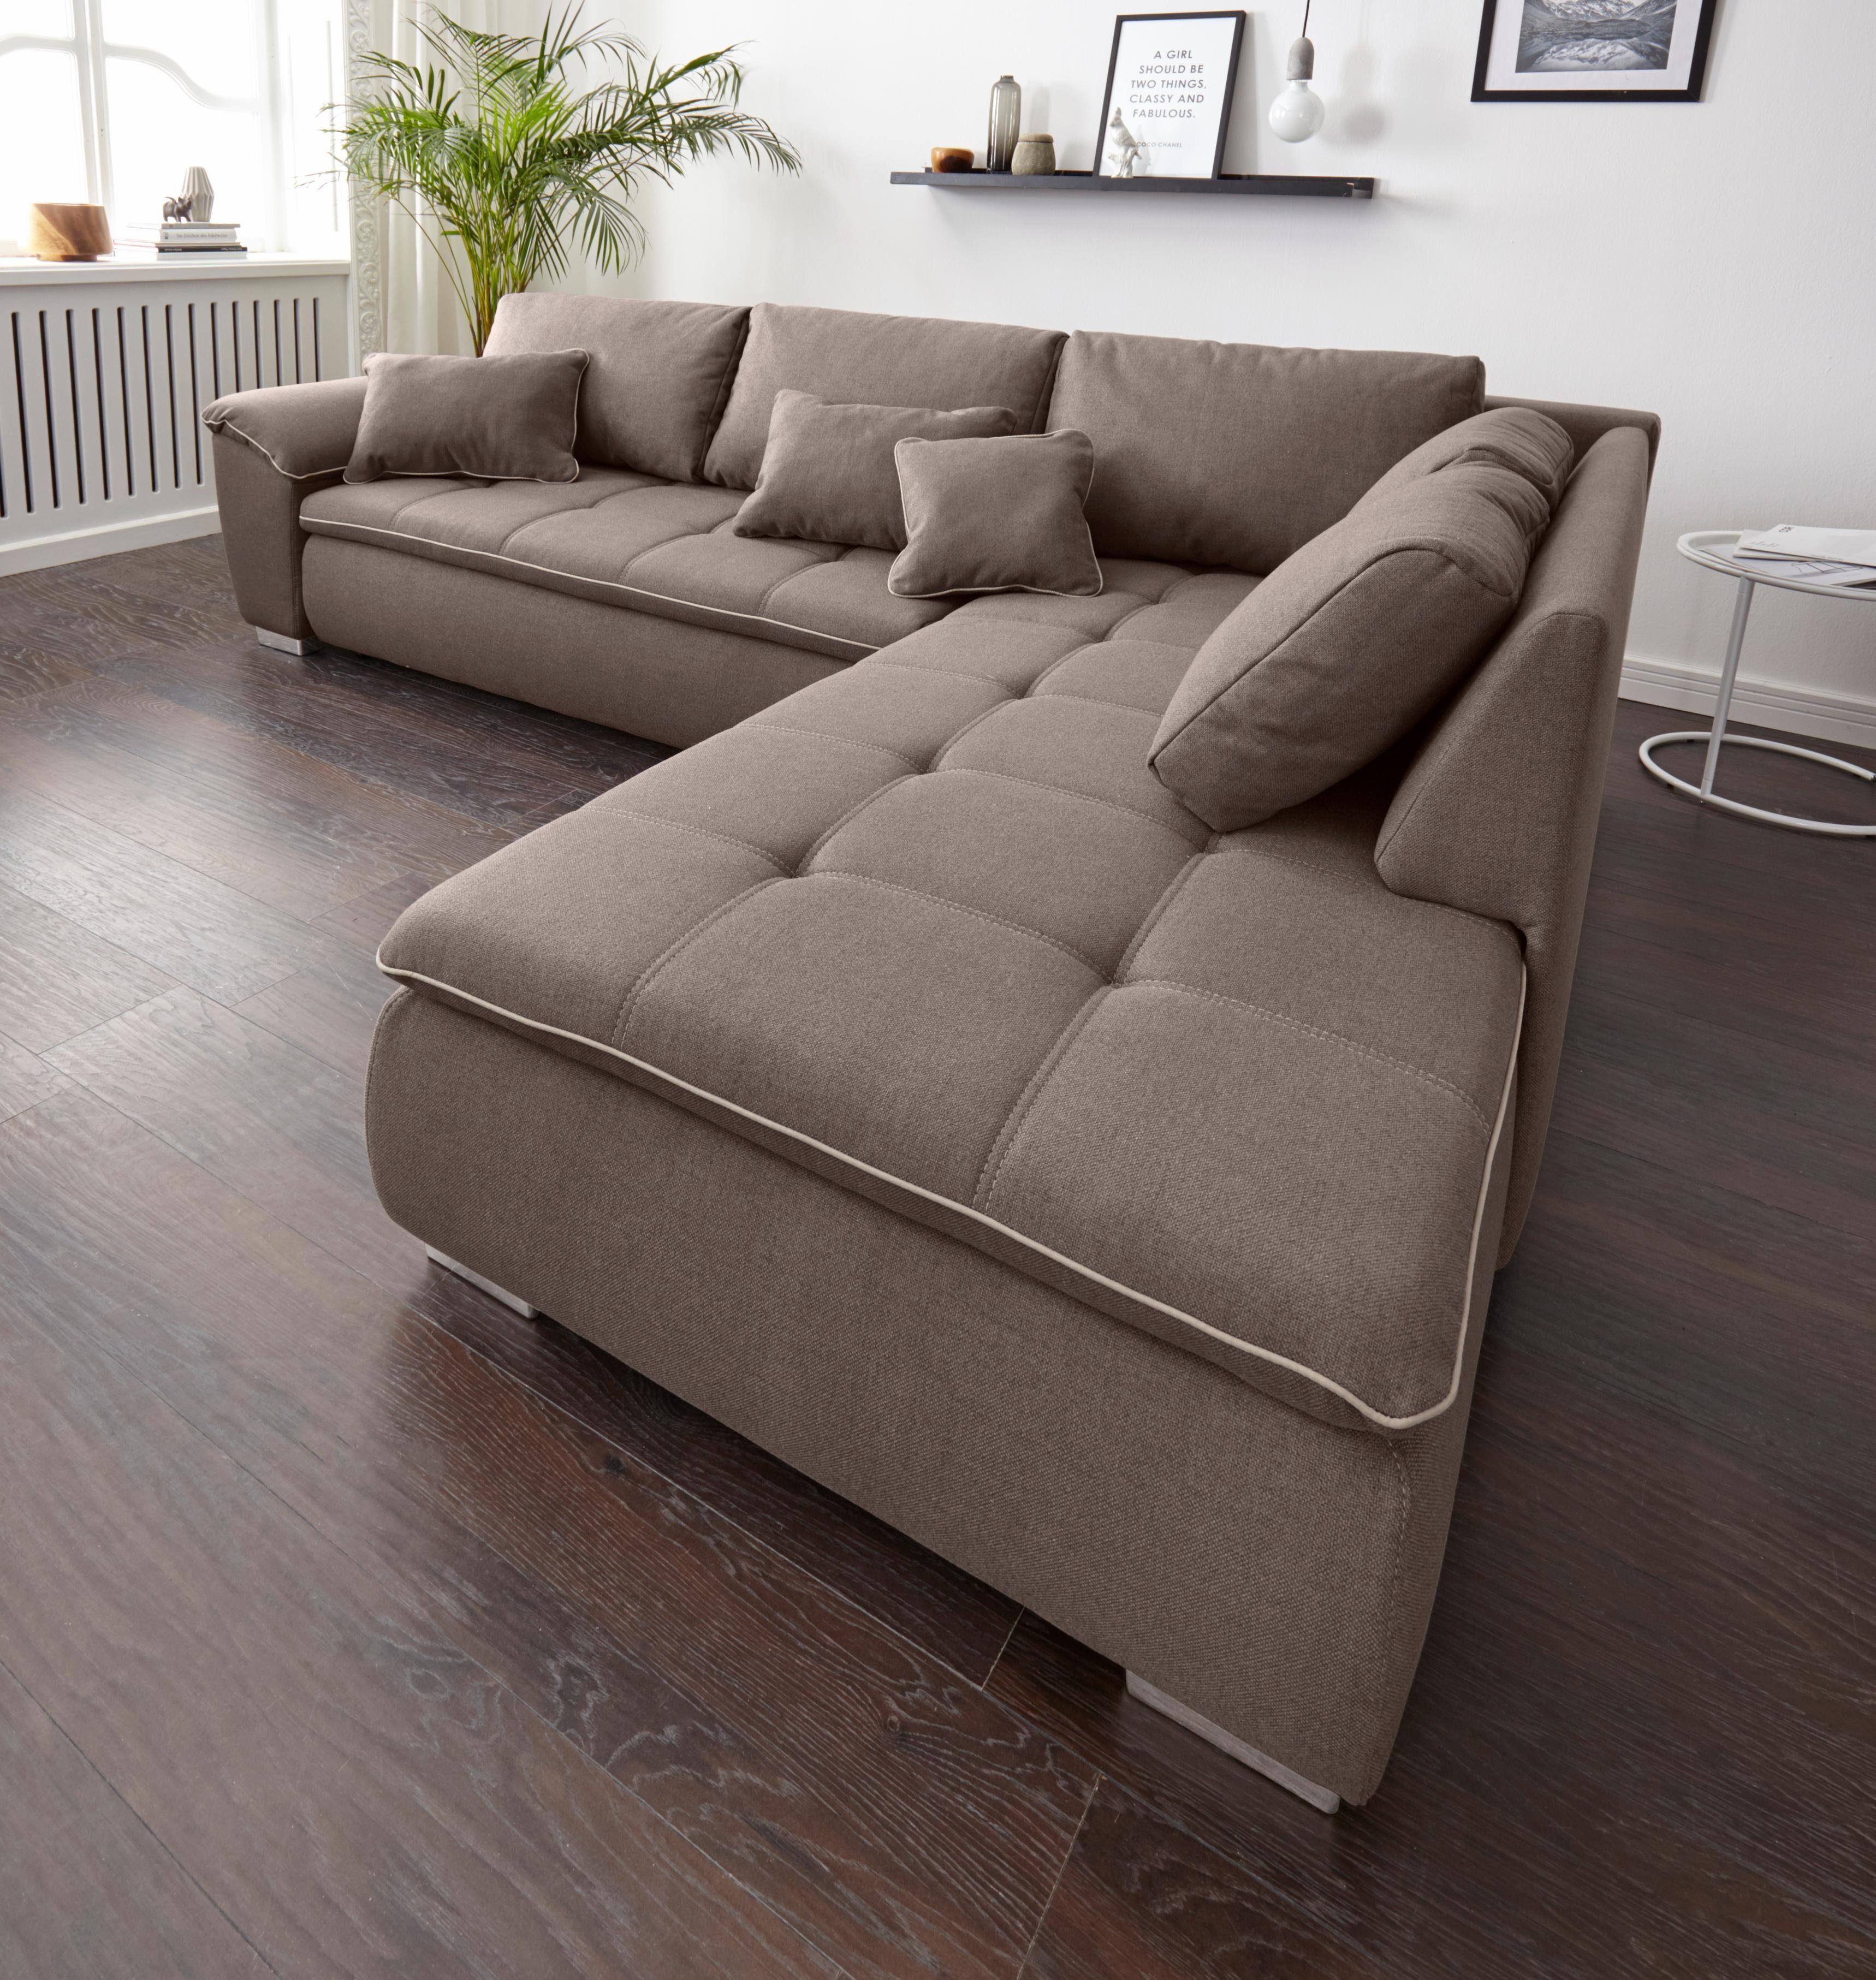 otto sofa garnitur great calia italia ledersofa garnitur gaia bestehend aus sitzer und sitzer. Black Bedroom Furniture Sets. Home Design Ideas